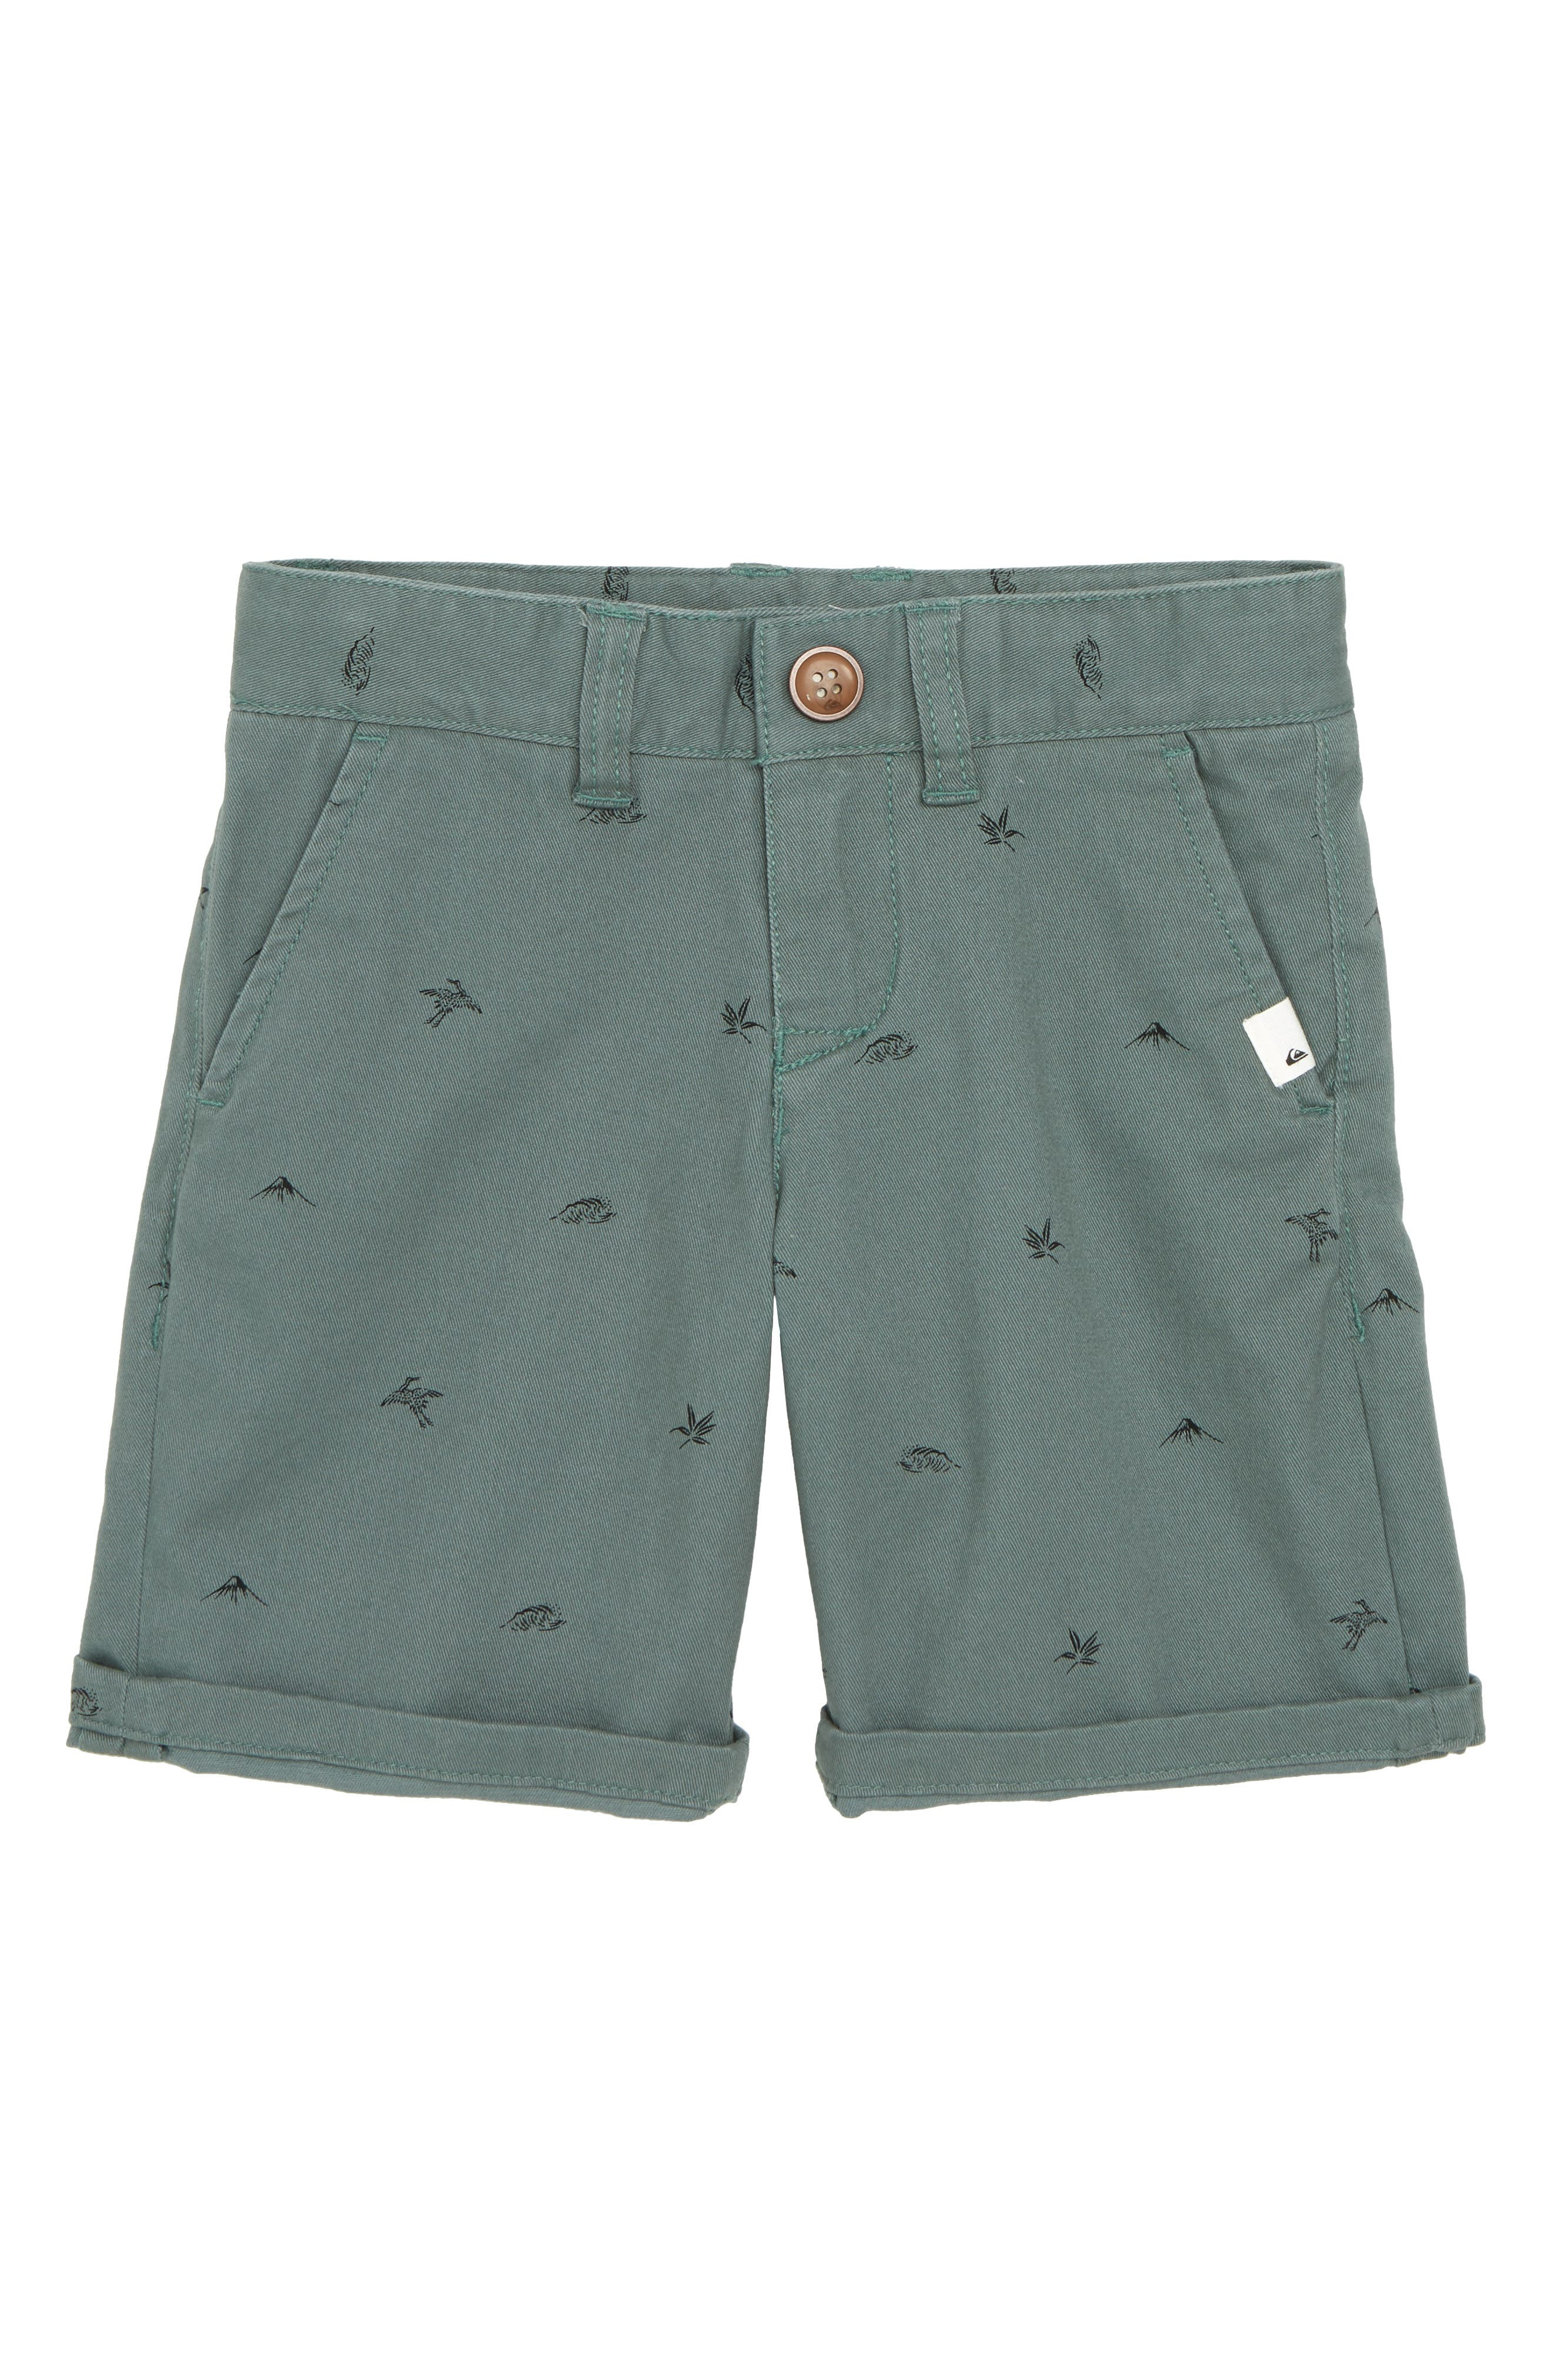 Fuji Stretch Cotton Shorts,                         Main,                         color, 301